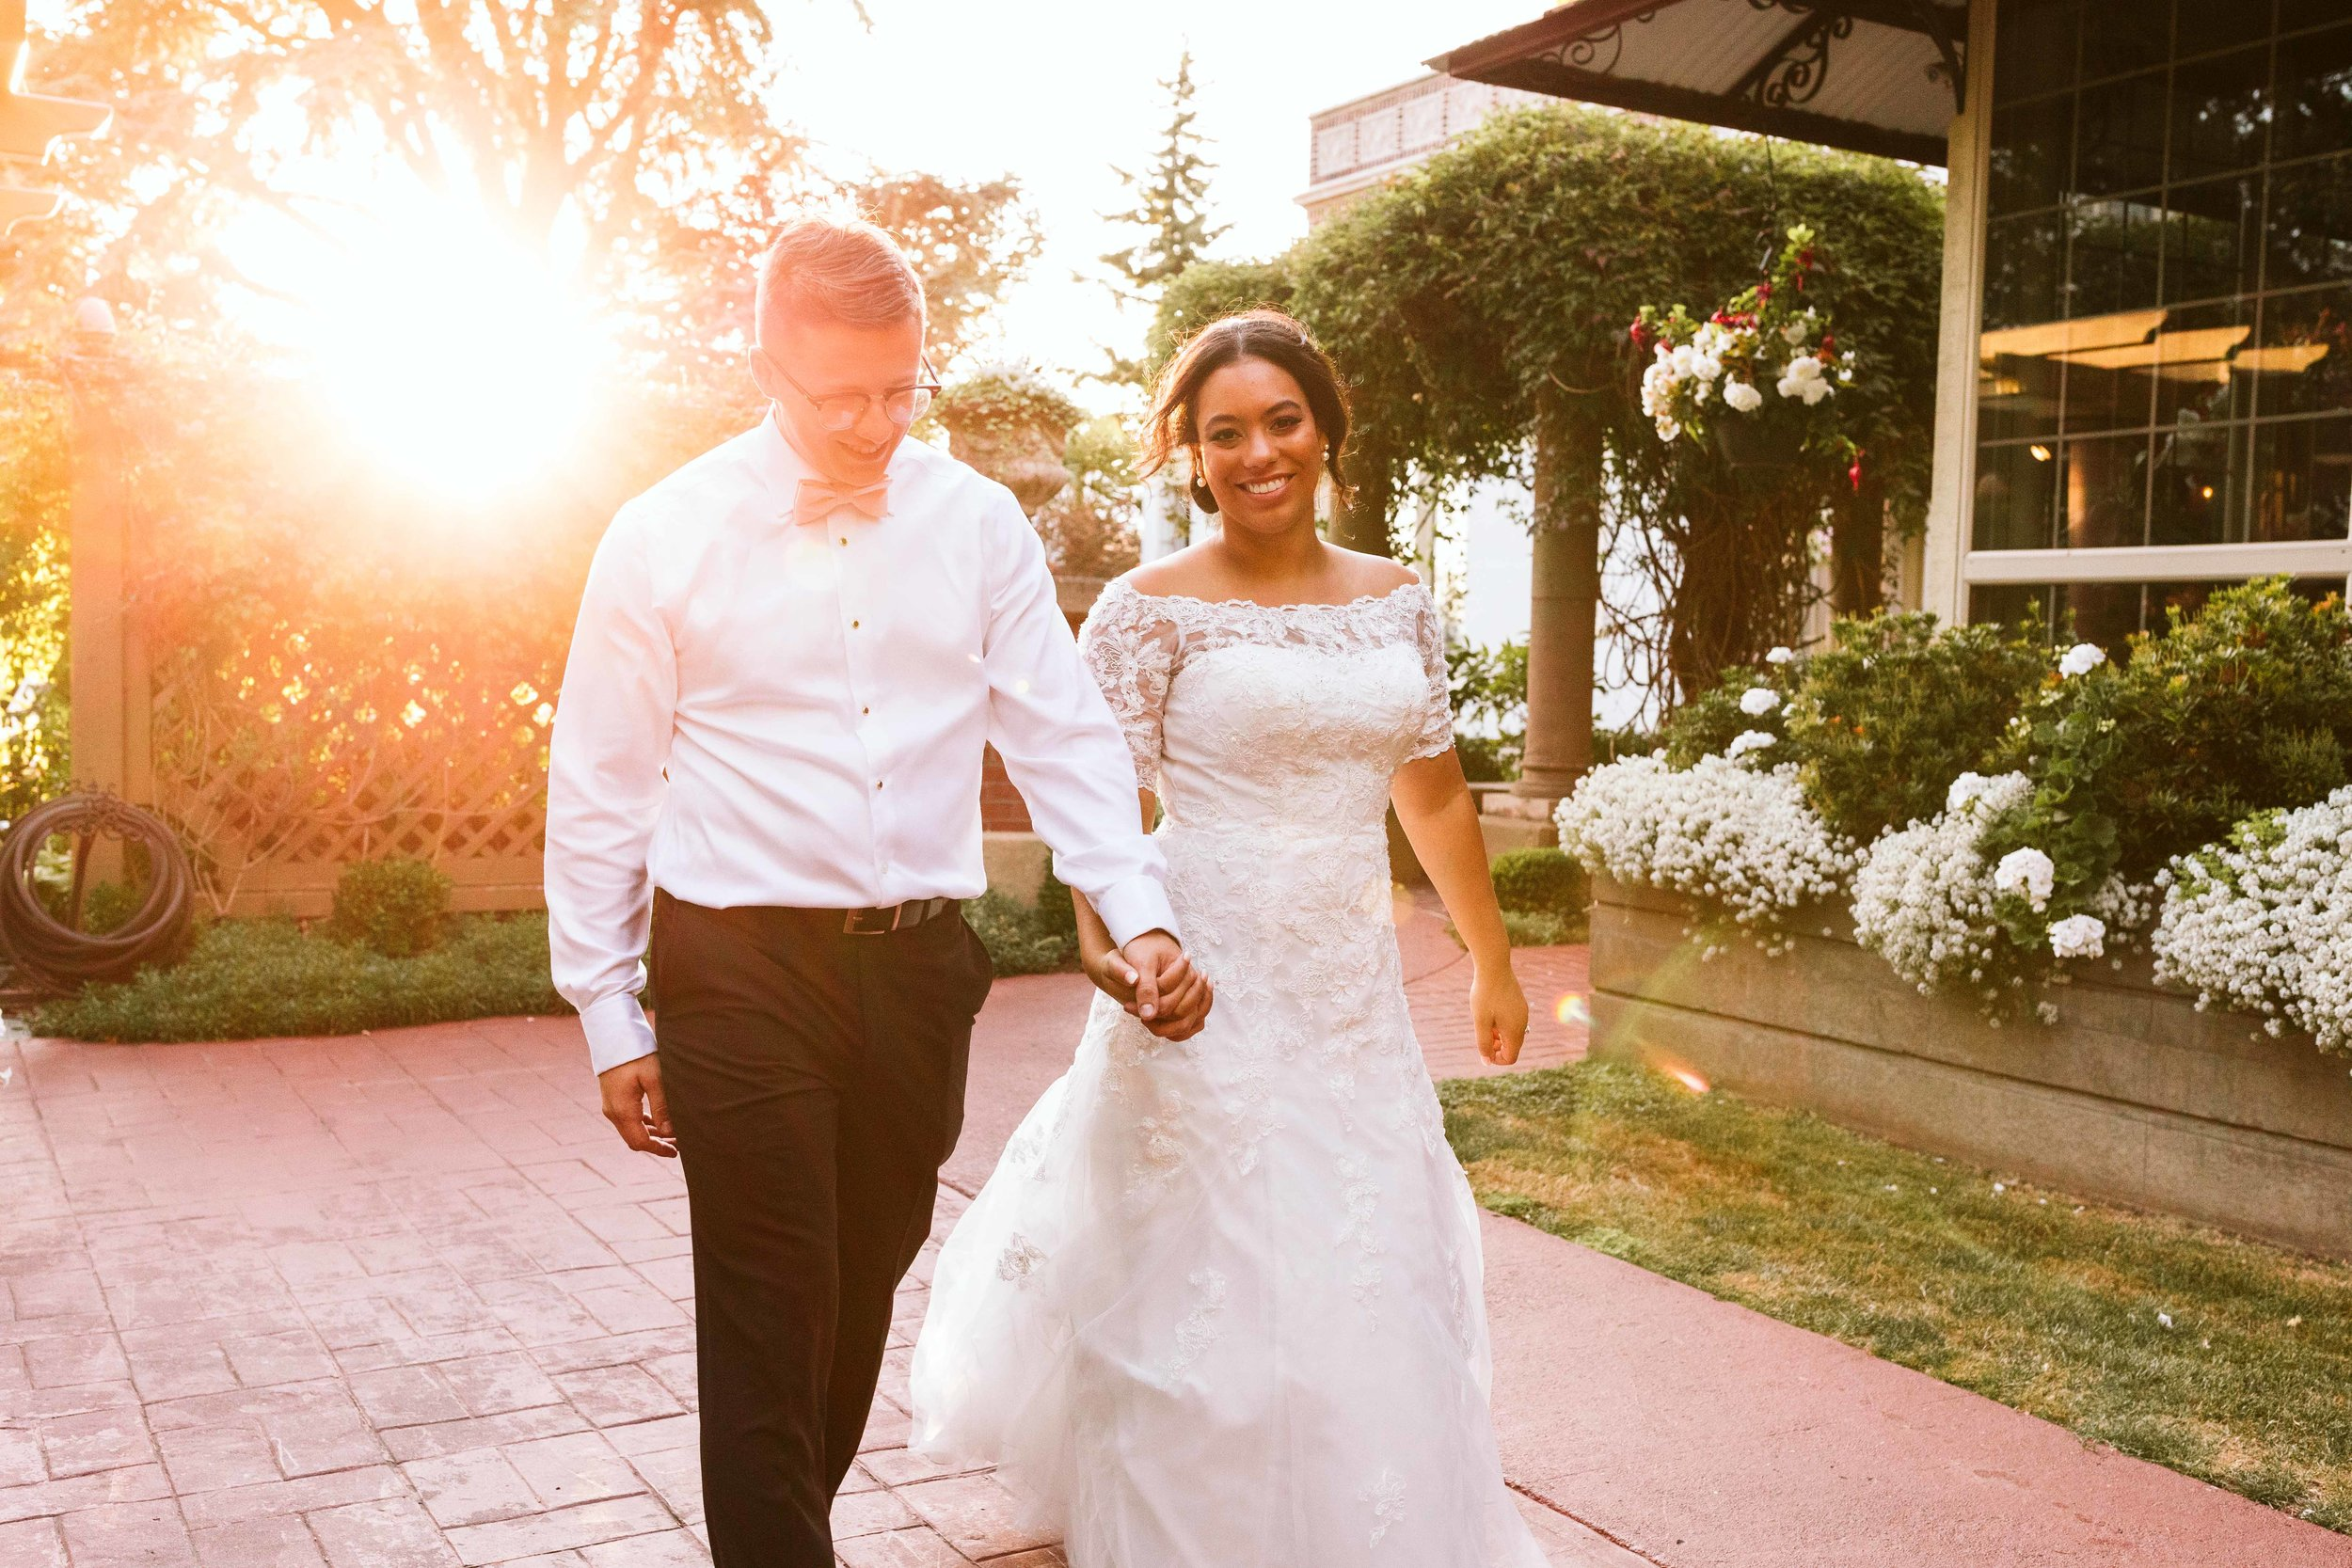 lairmont-manor-wedding-105.jpg